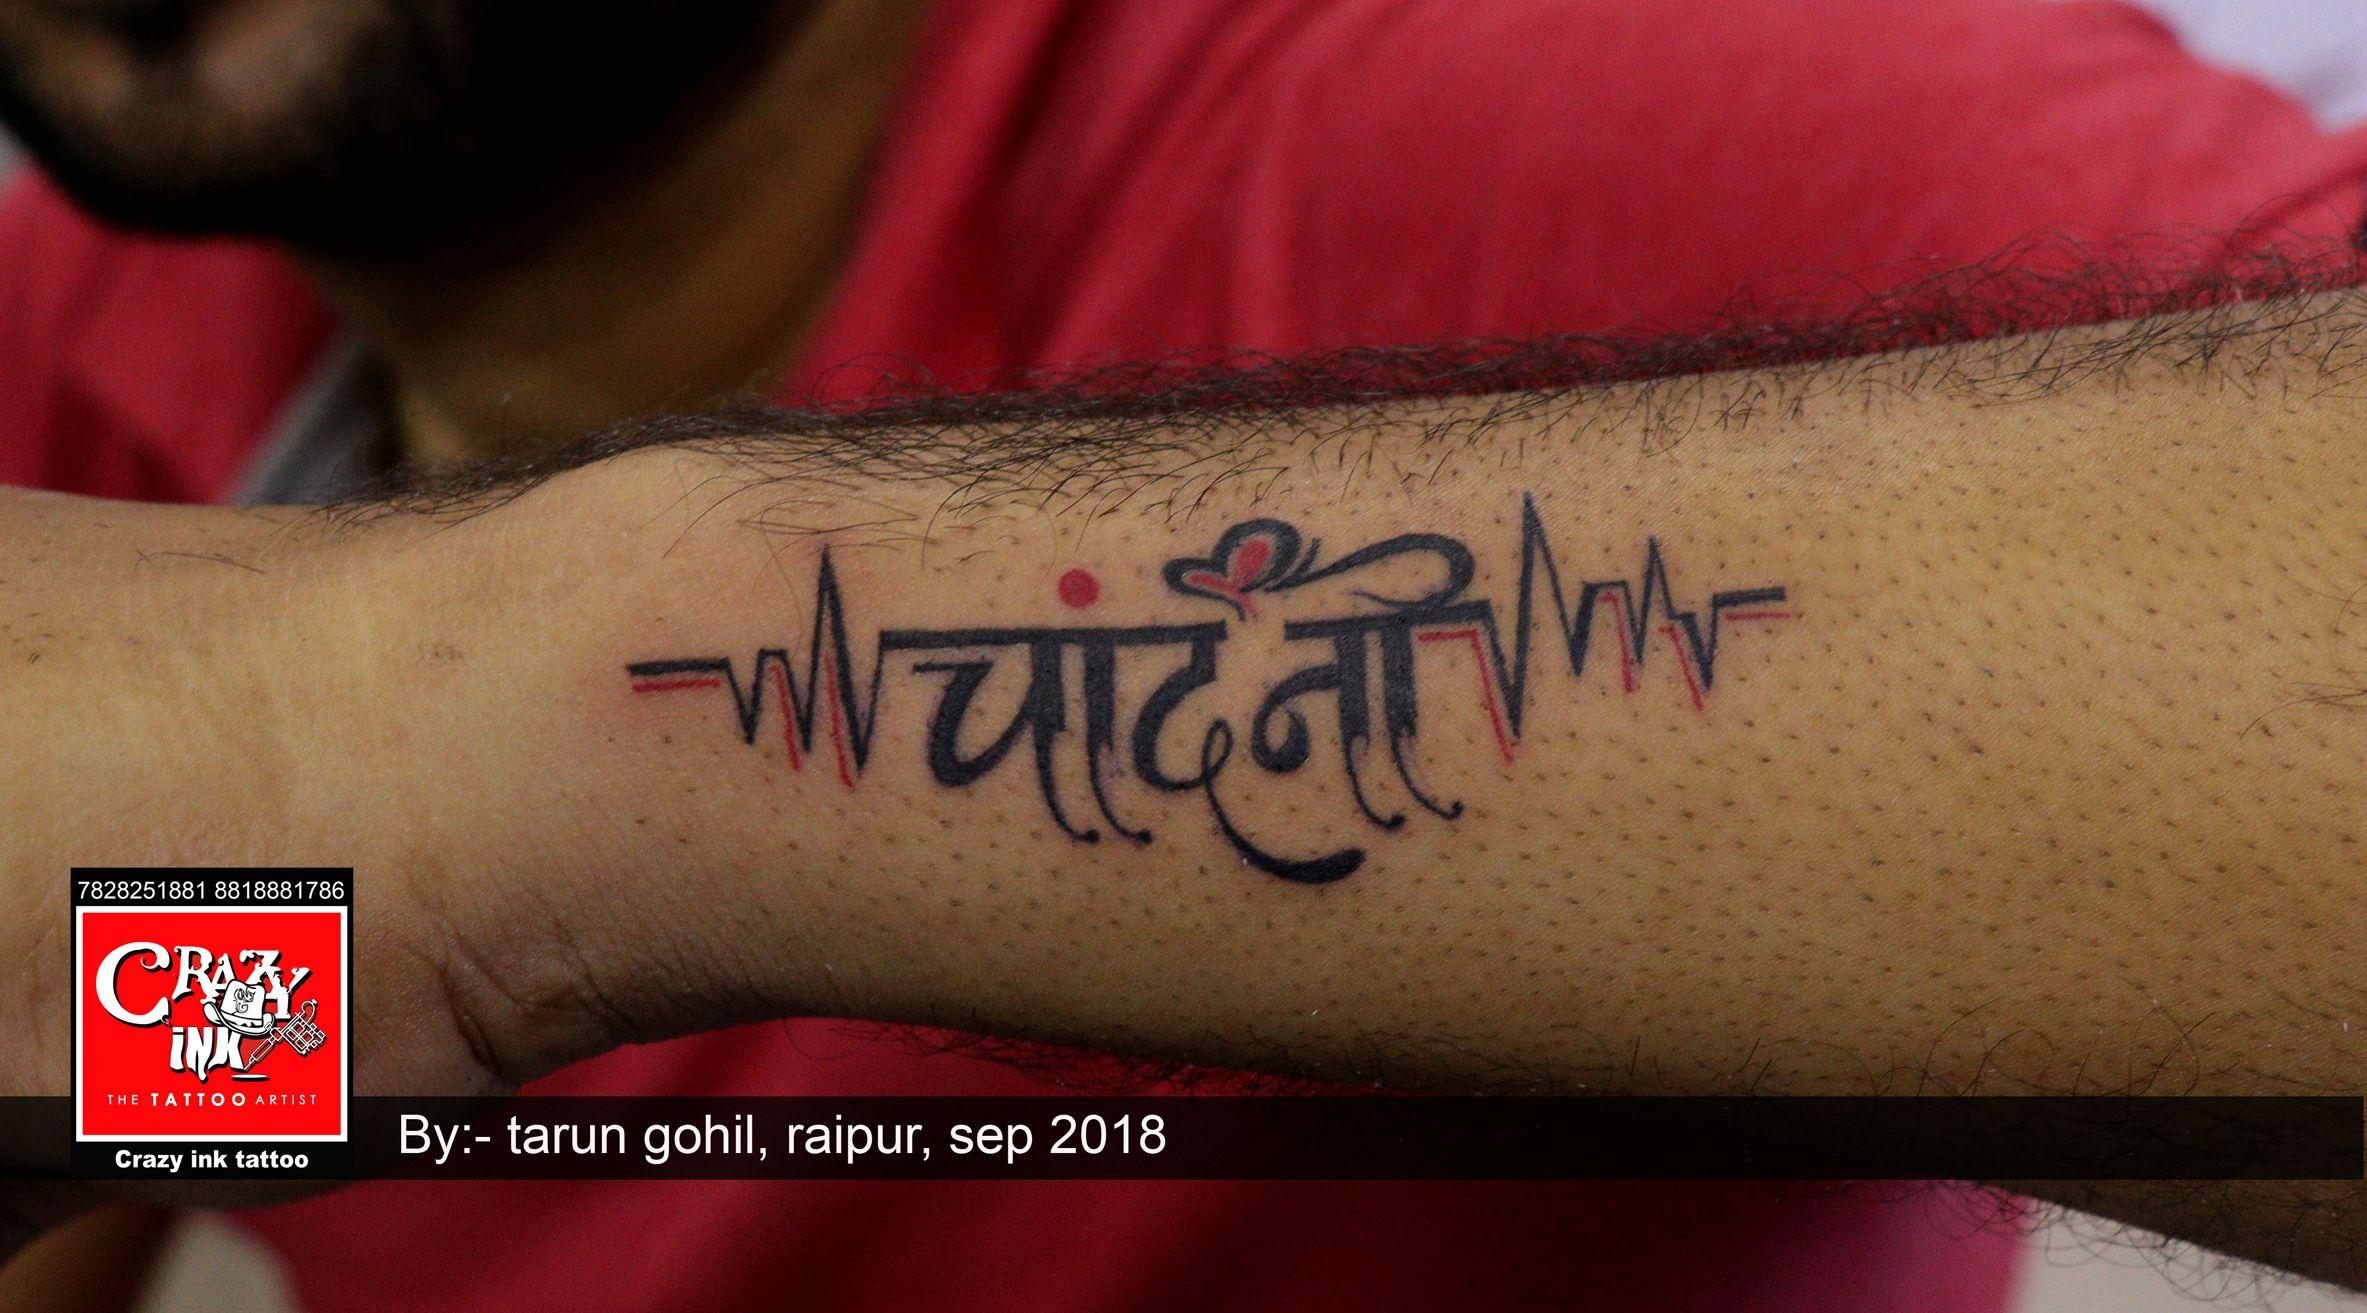 Chandni Name Tattoo With Heart Beat By Tarun Gohil Done At Crazy Ink Tattoo Studio Raipur Nametattoo Chandninametattoo Ink Tattoo Alien Tattoo Name Tattoo